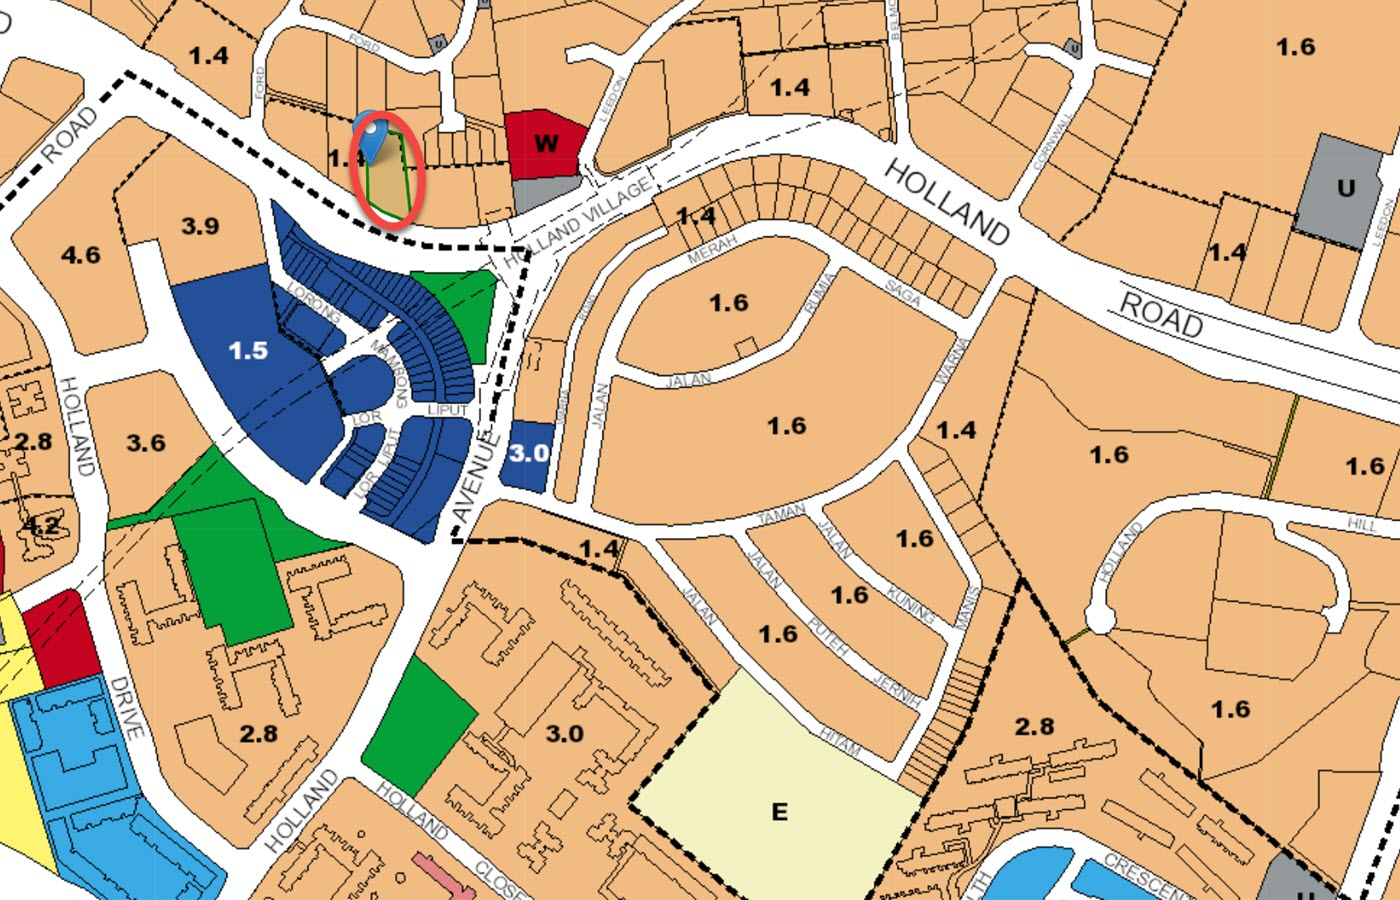 Van Holland Condo Location - URA Master Plan Map